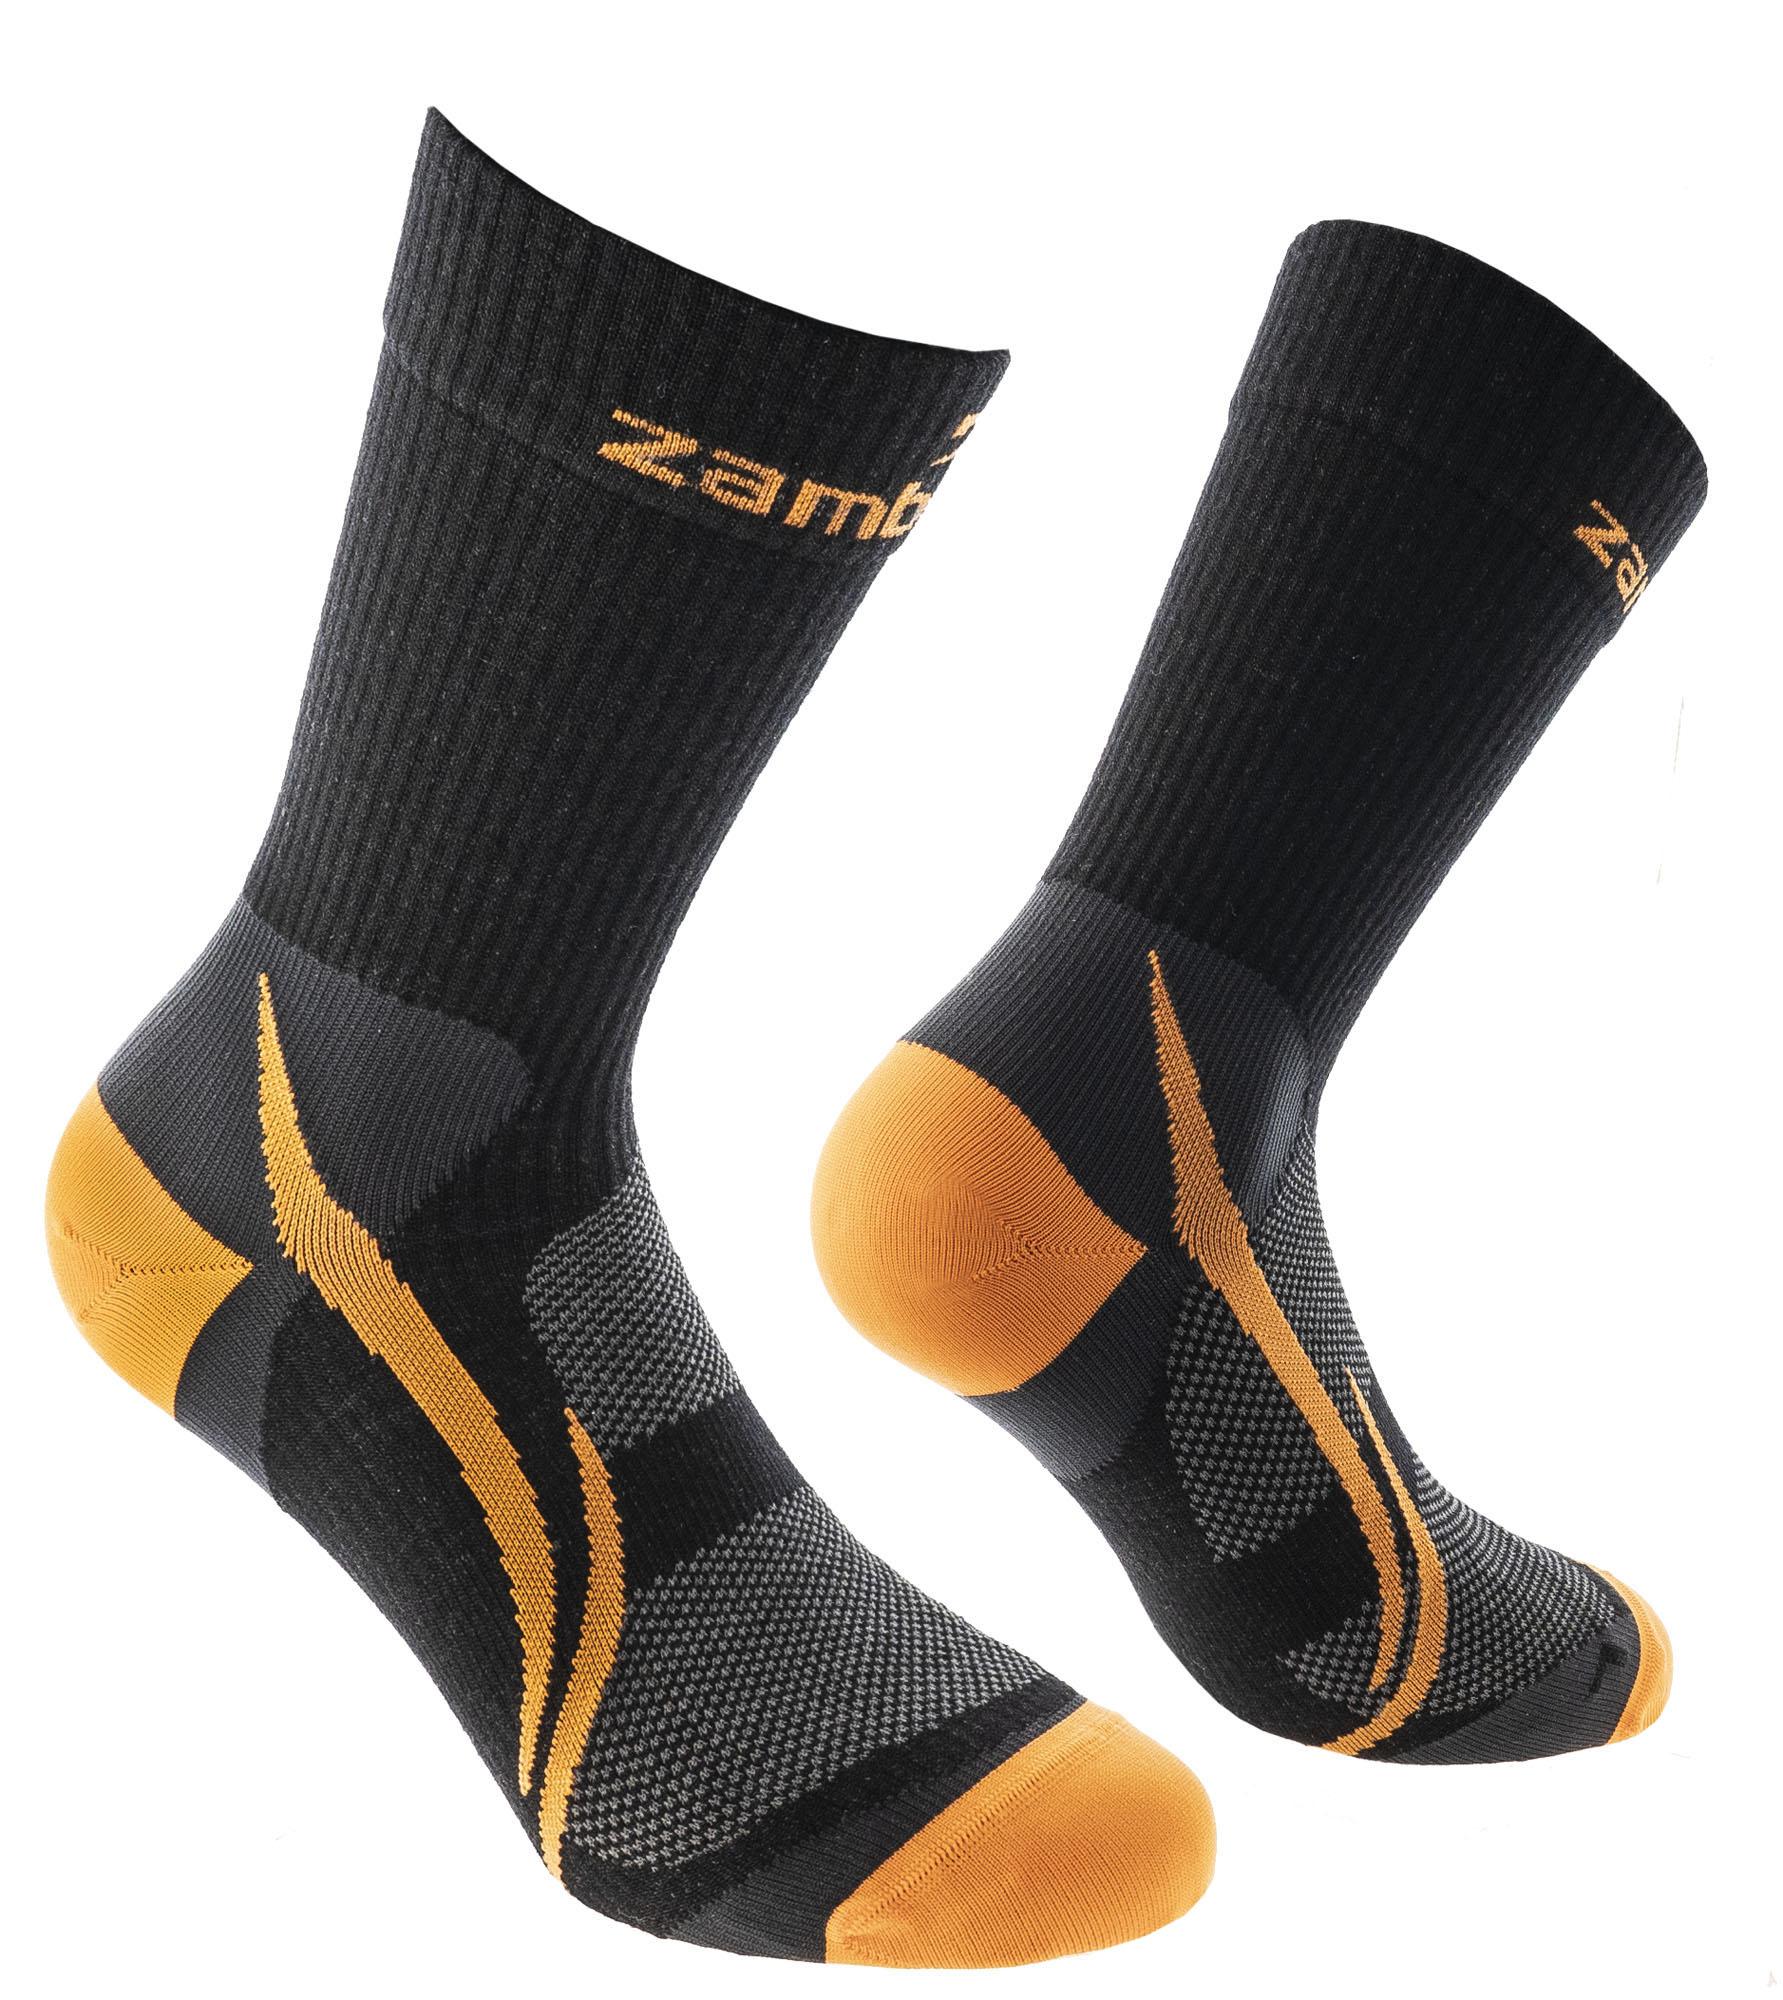 CALZE ZAMBERLAN® TRAIL LITE PATH - Black/Orange